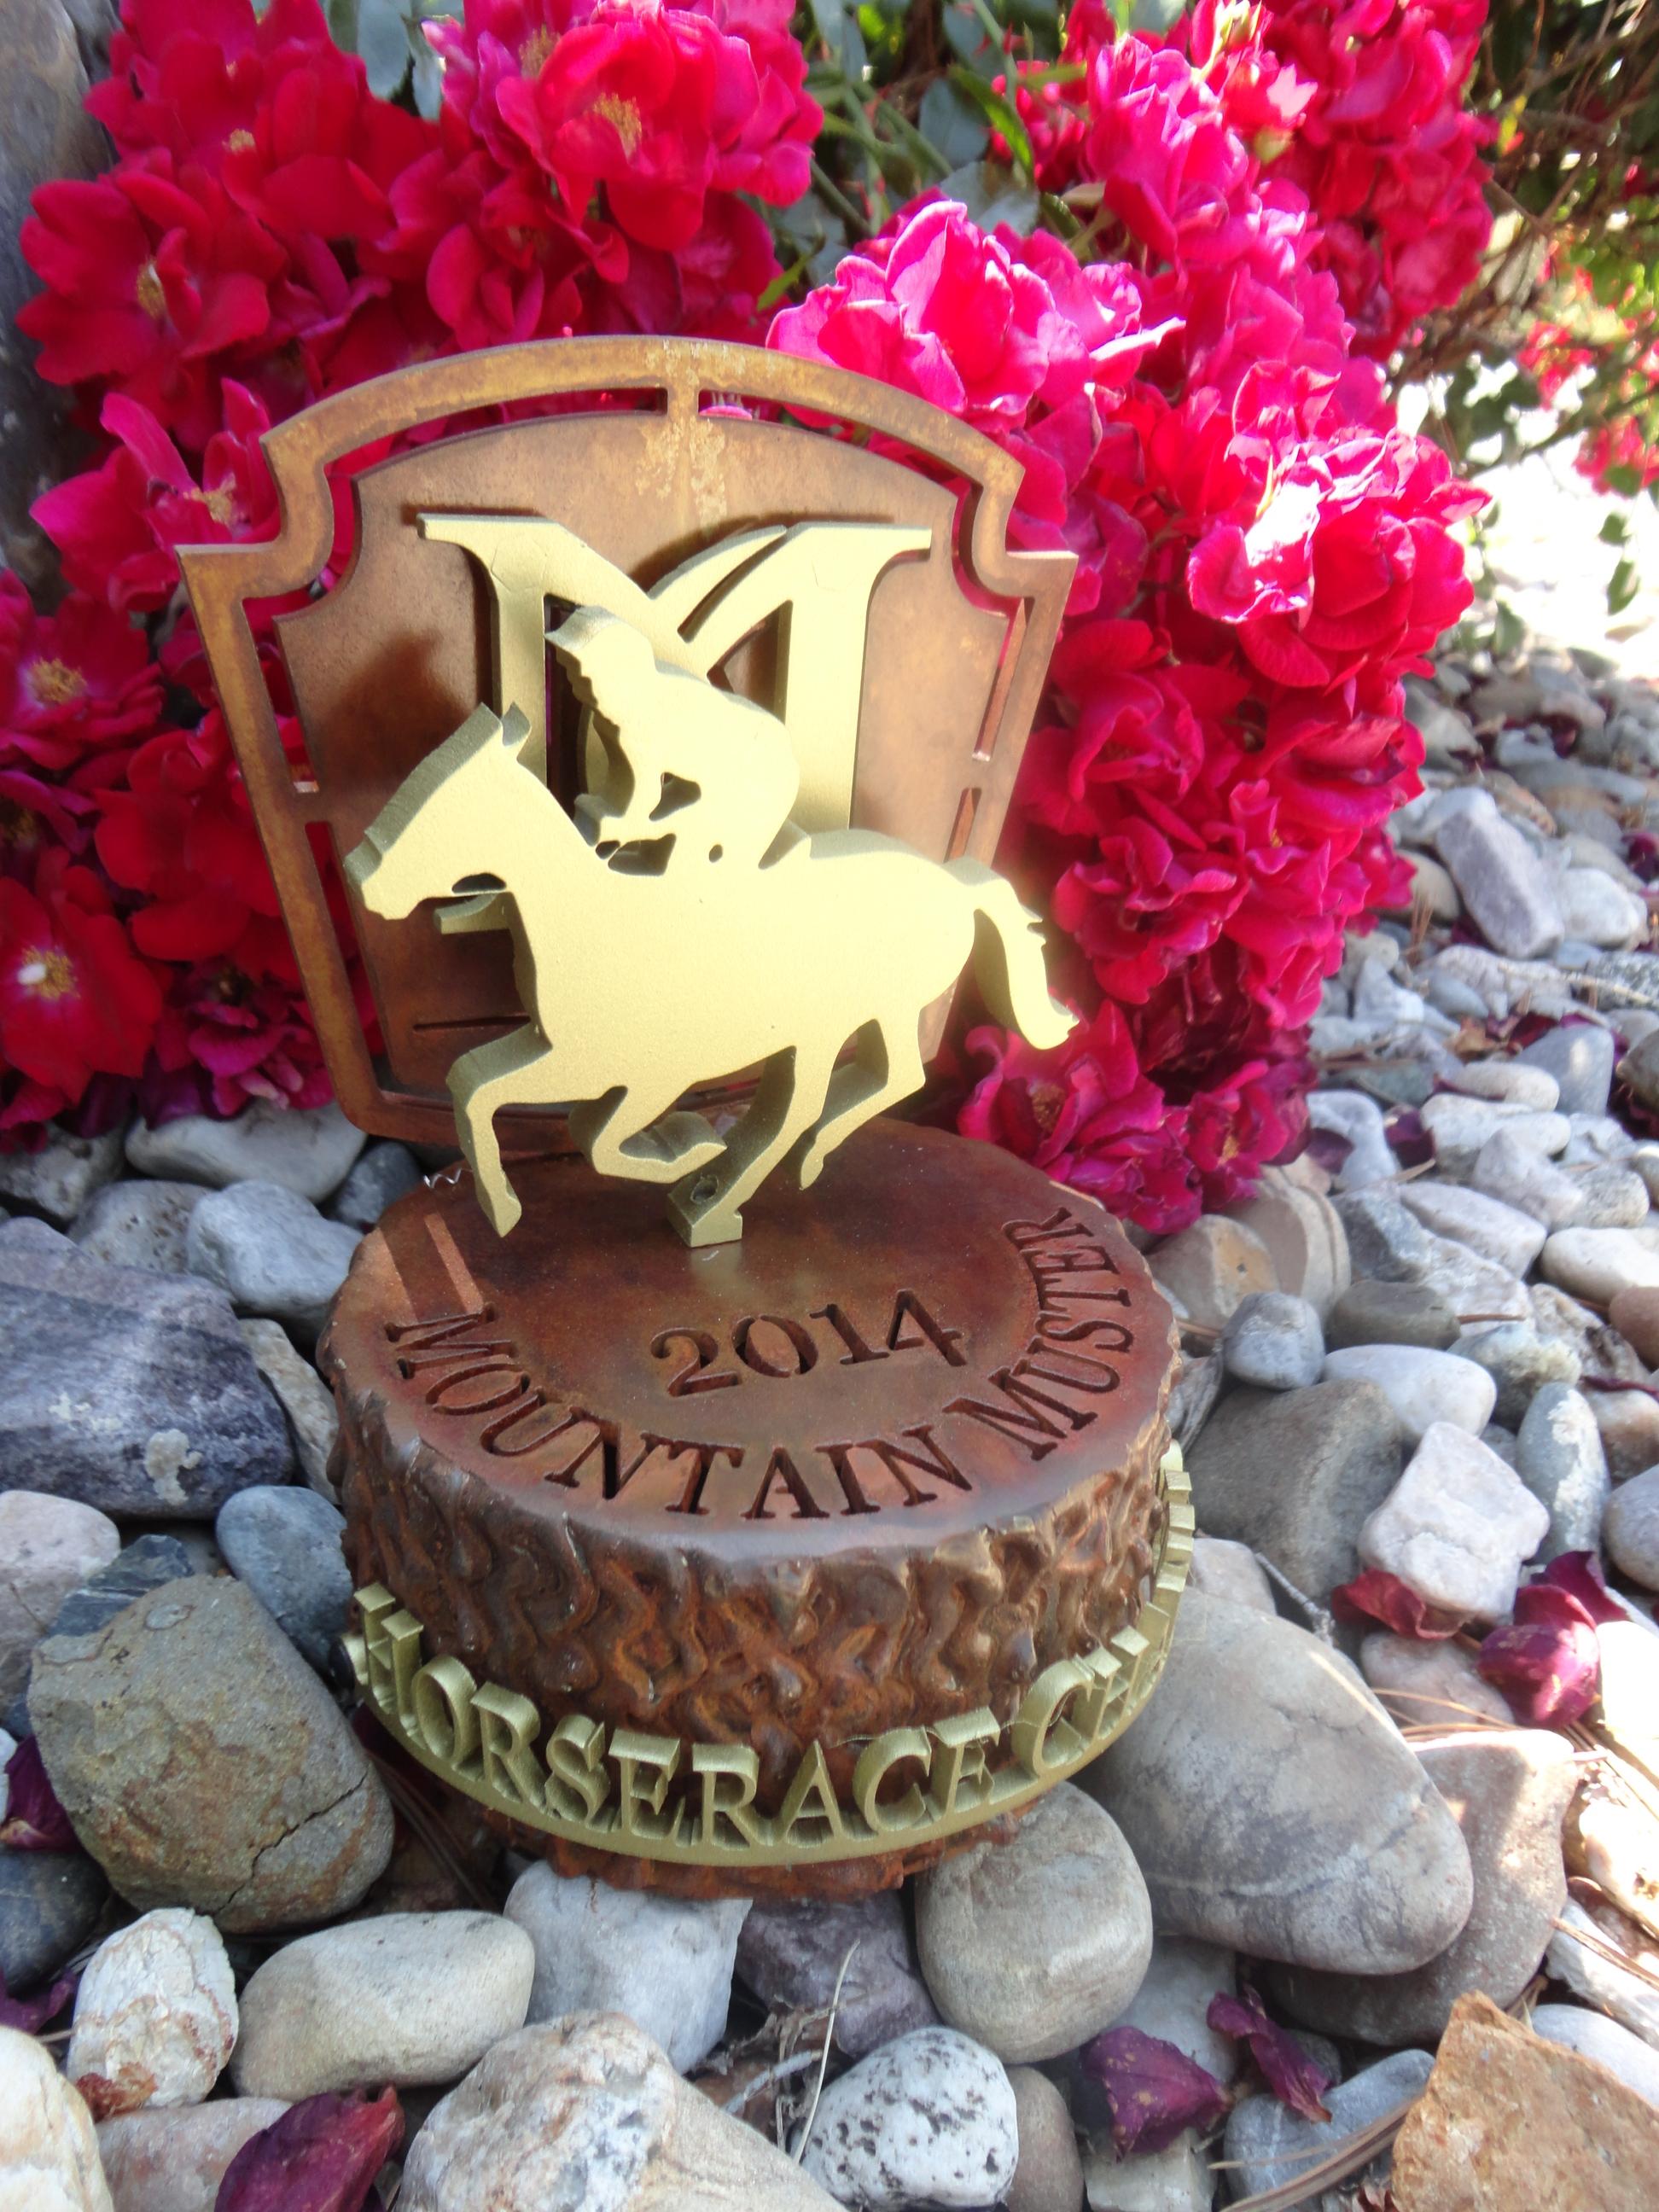 MARTIS CAMP -Golf Horserace Trophy